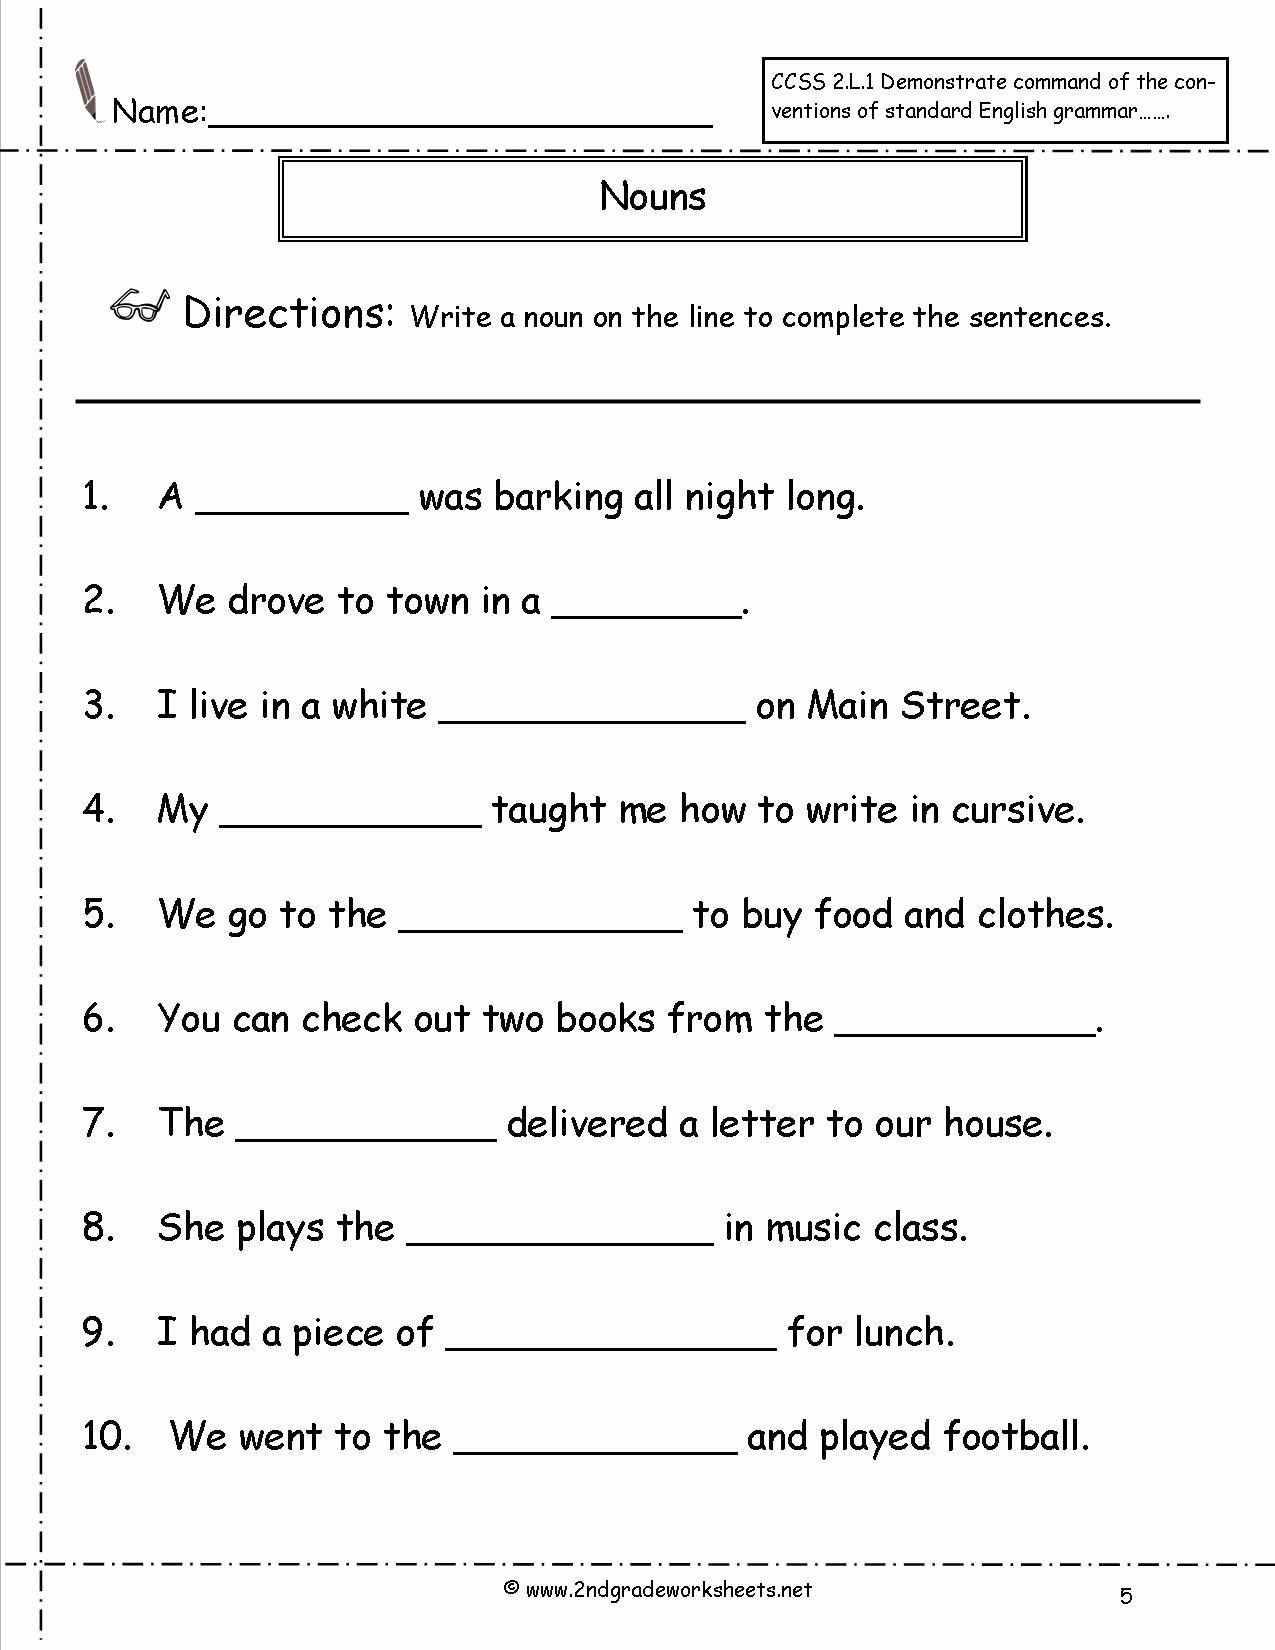 Homograph Worksheets 5th Grade Luxury Homophones Worksheet 5th Grade